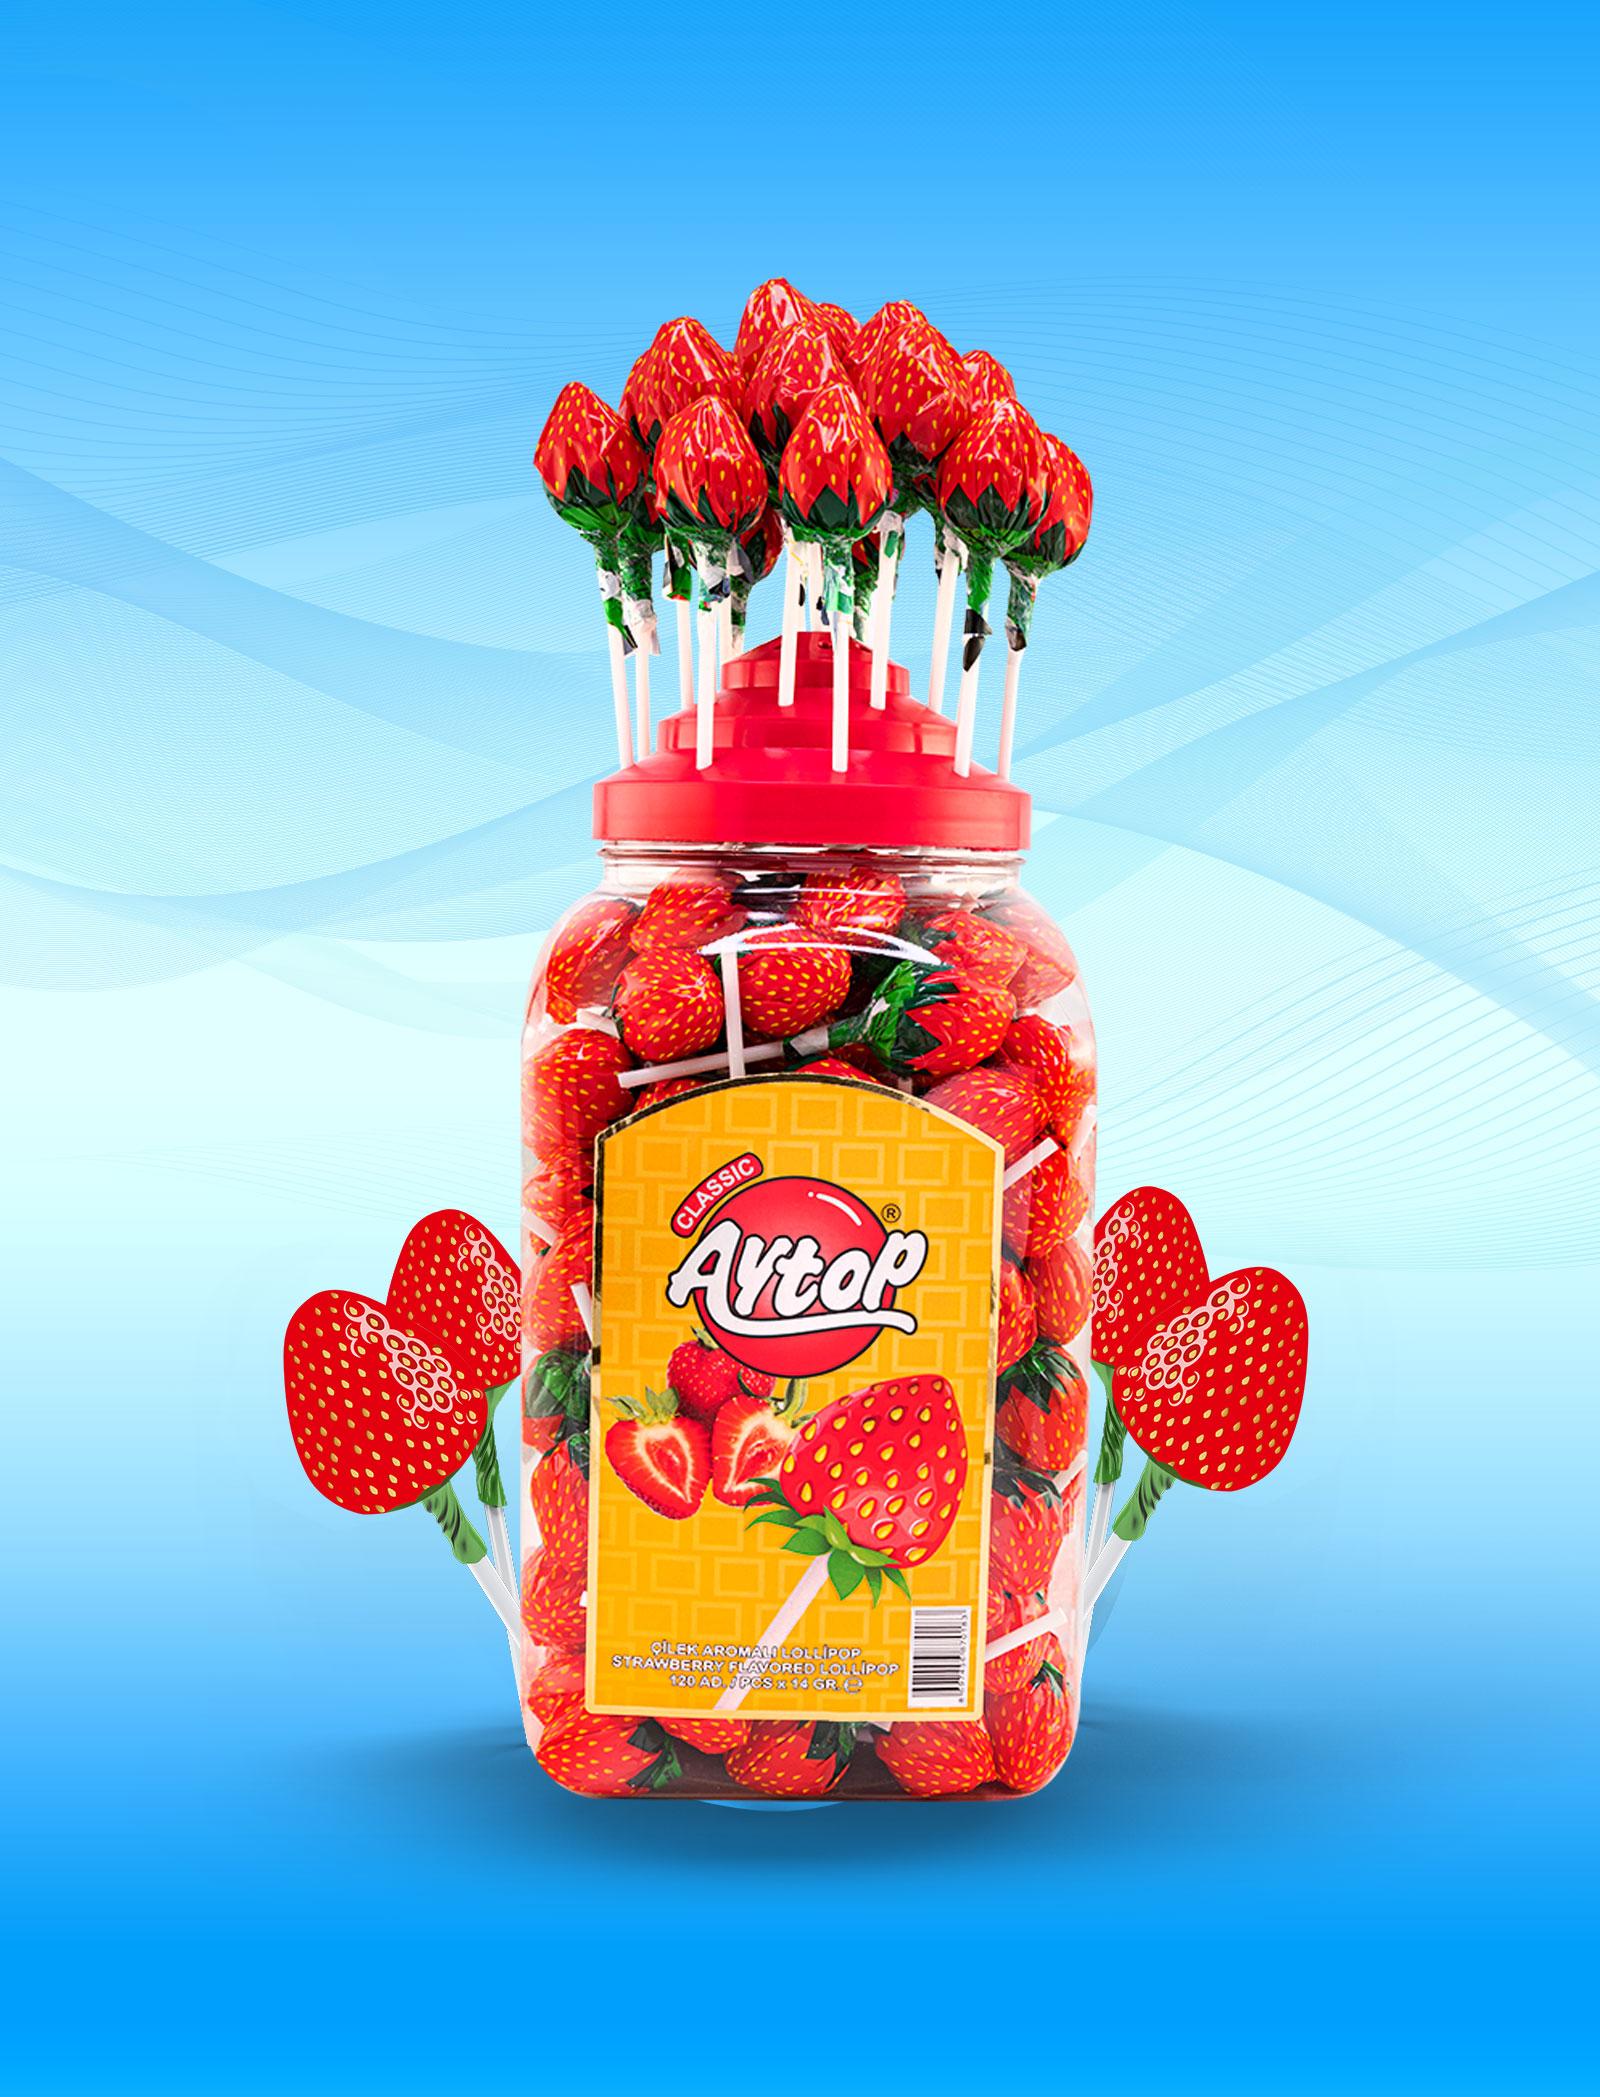 Aytop Strawberry Shape